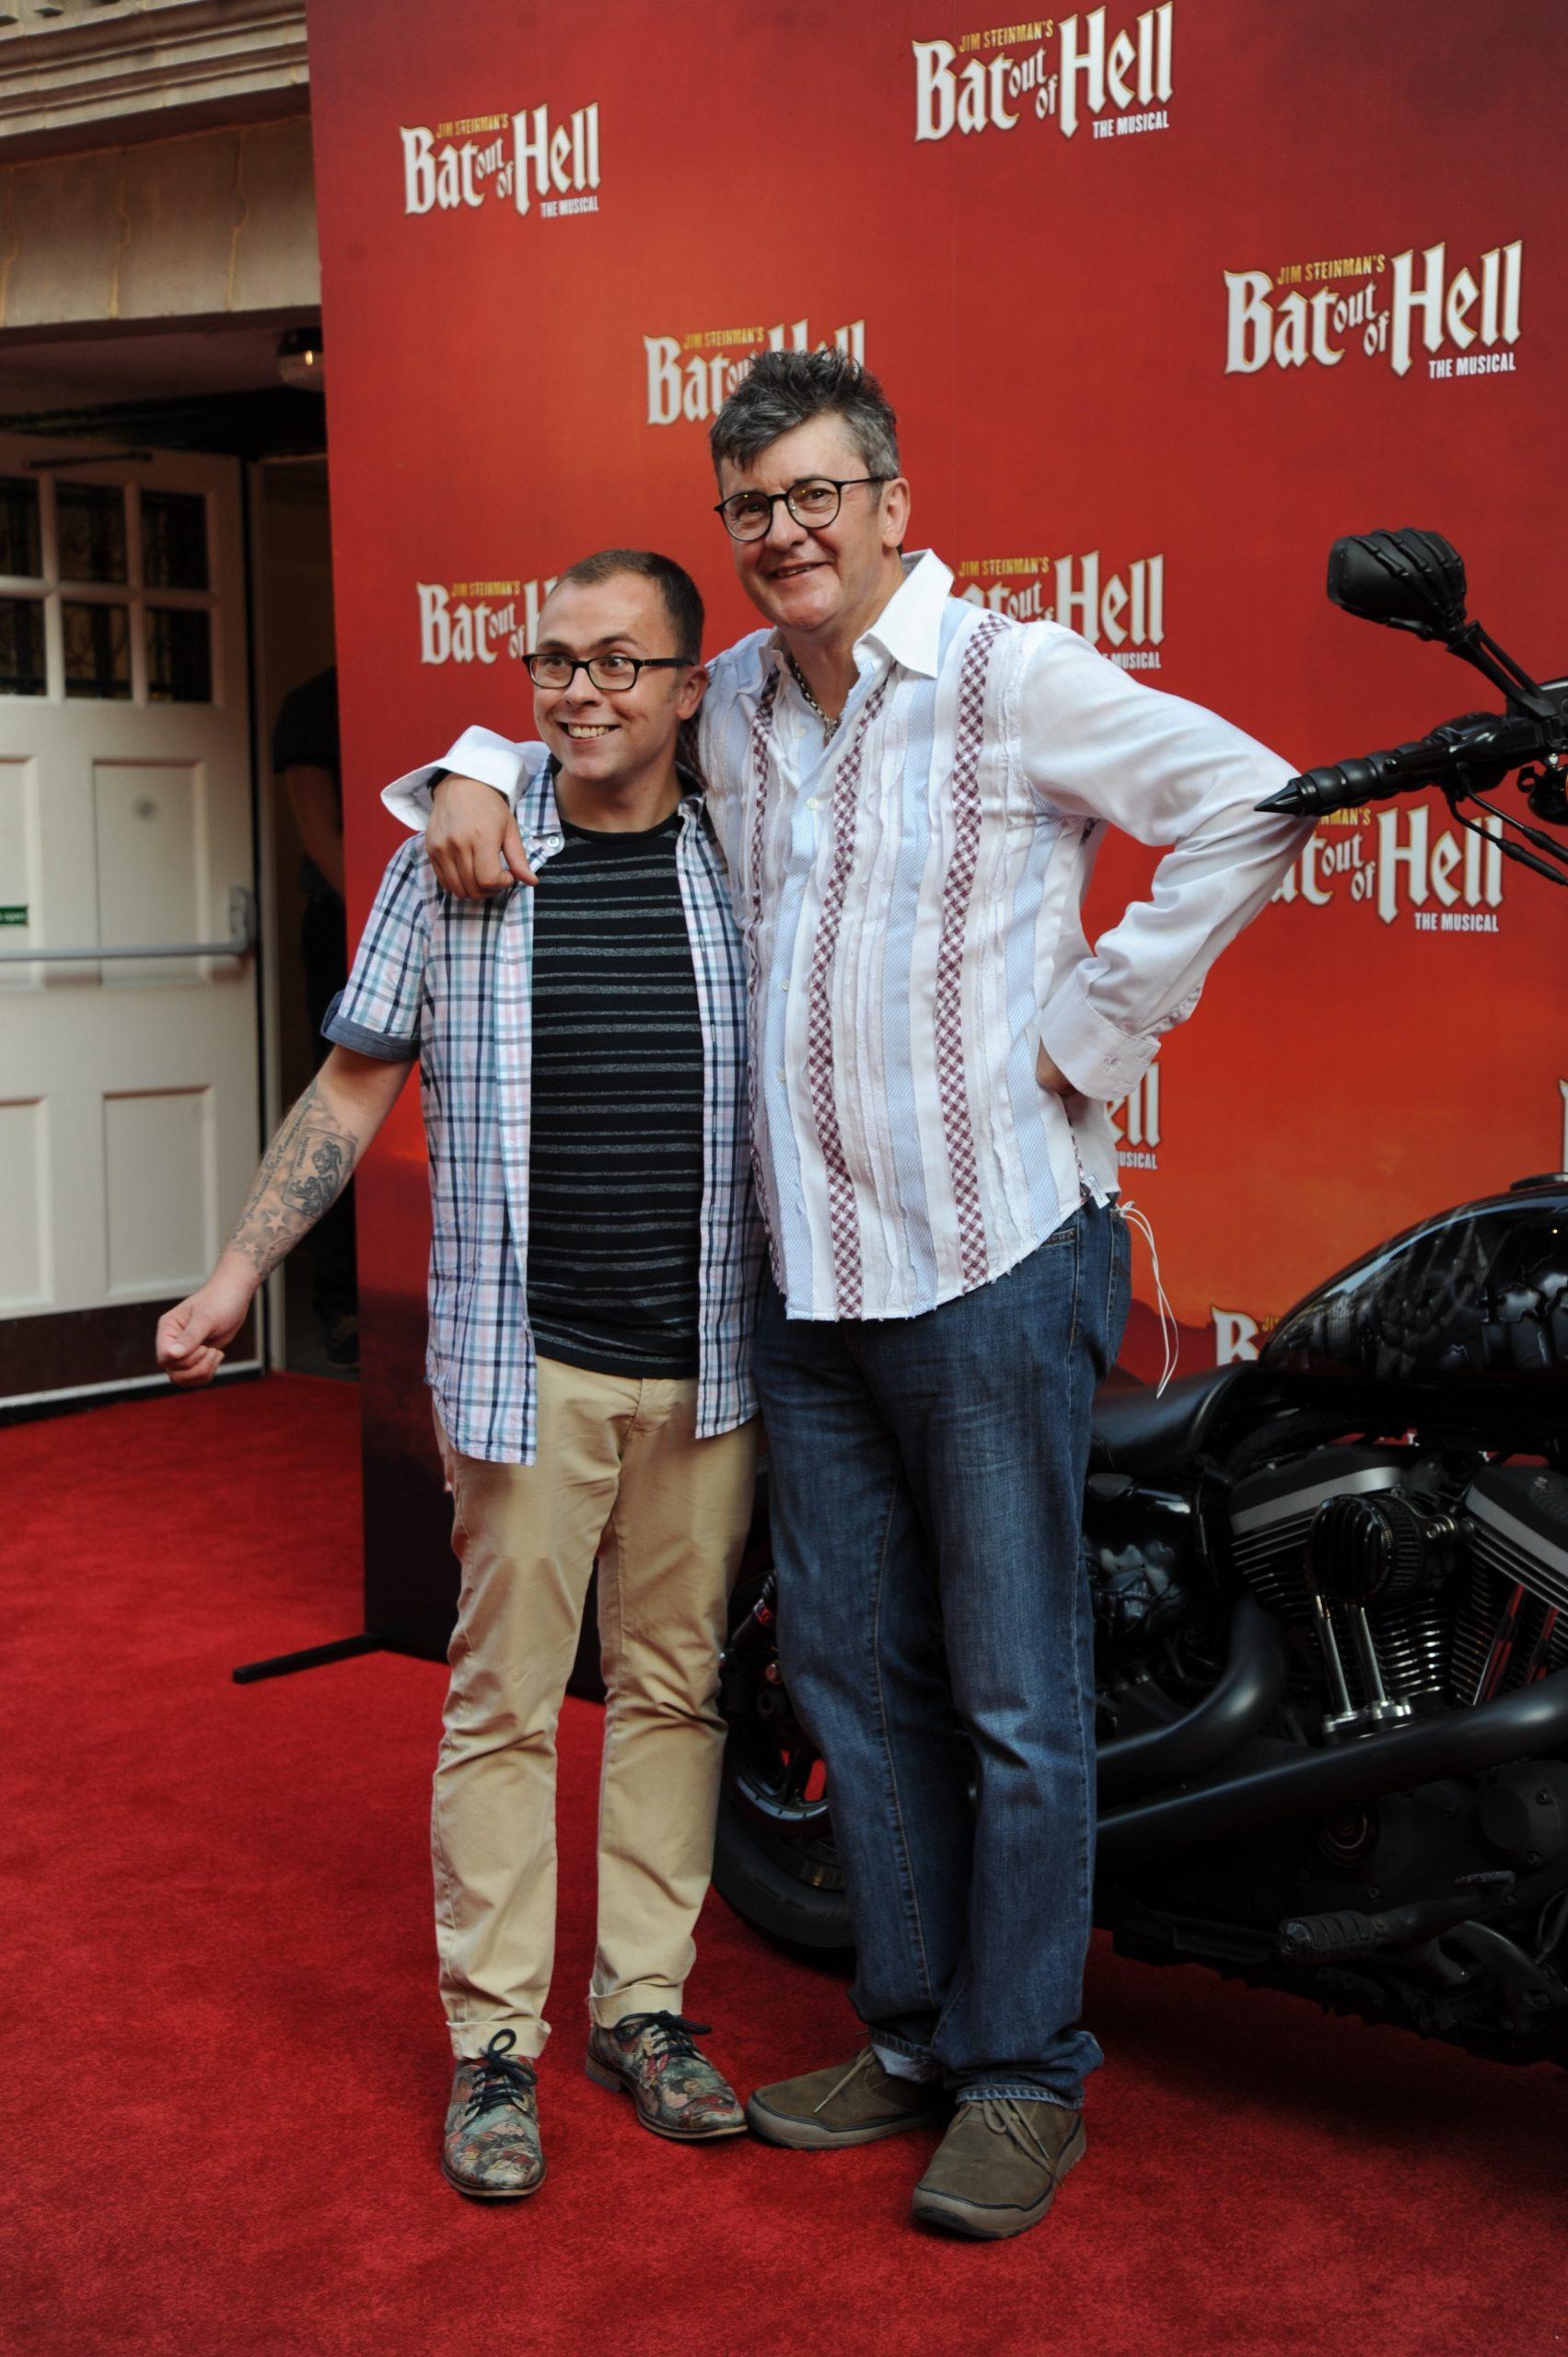 Joe Pasquale and son Joe Tracini